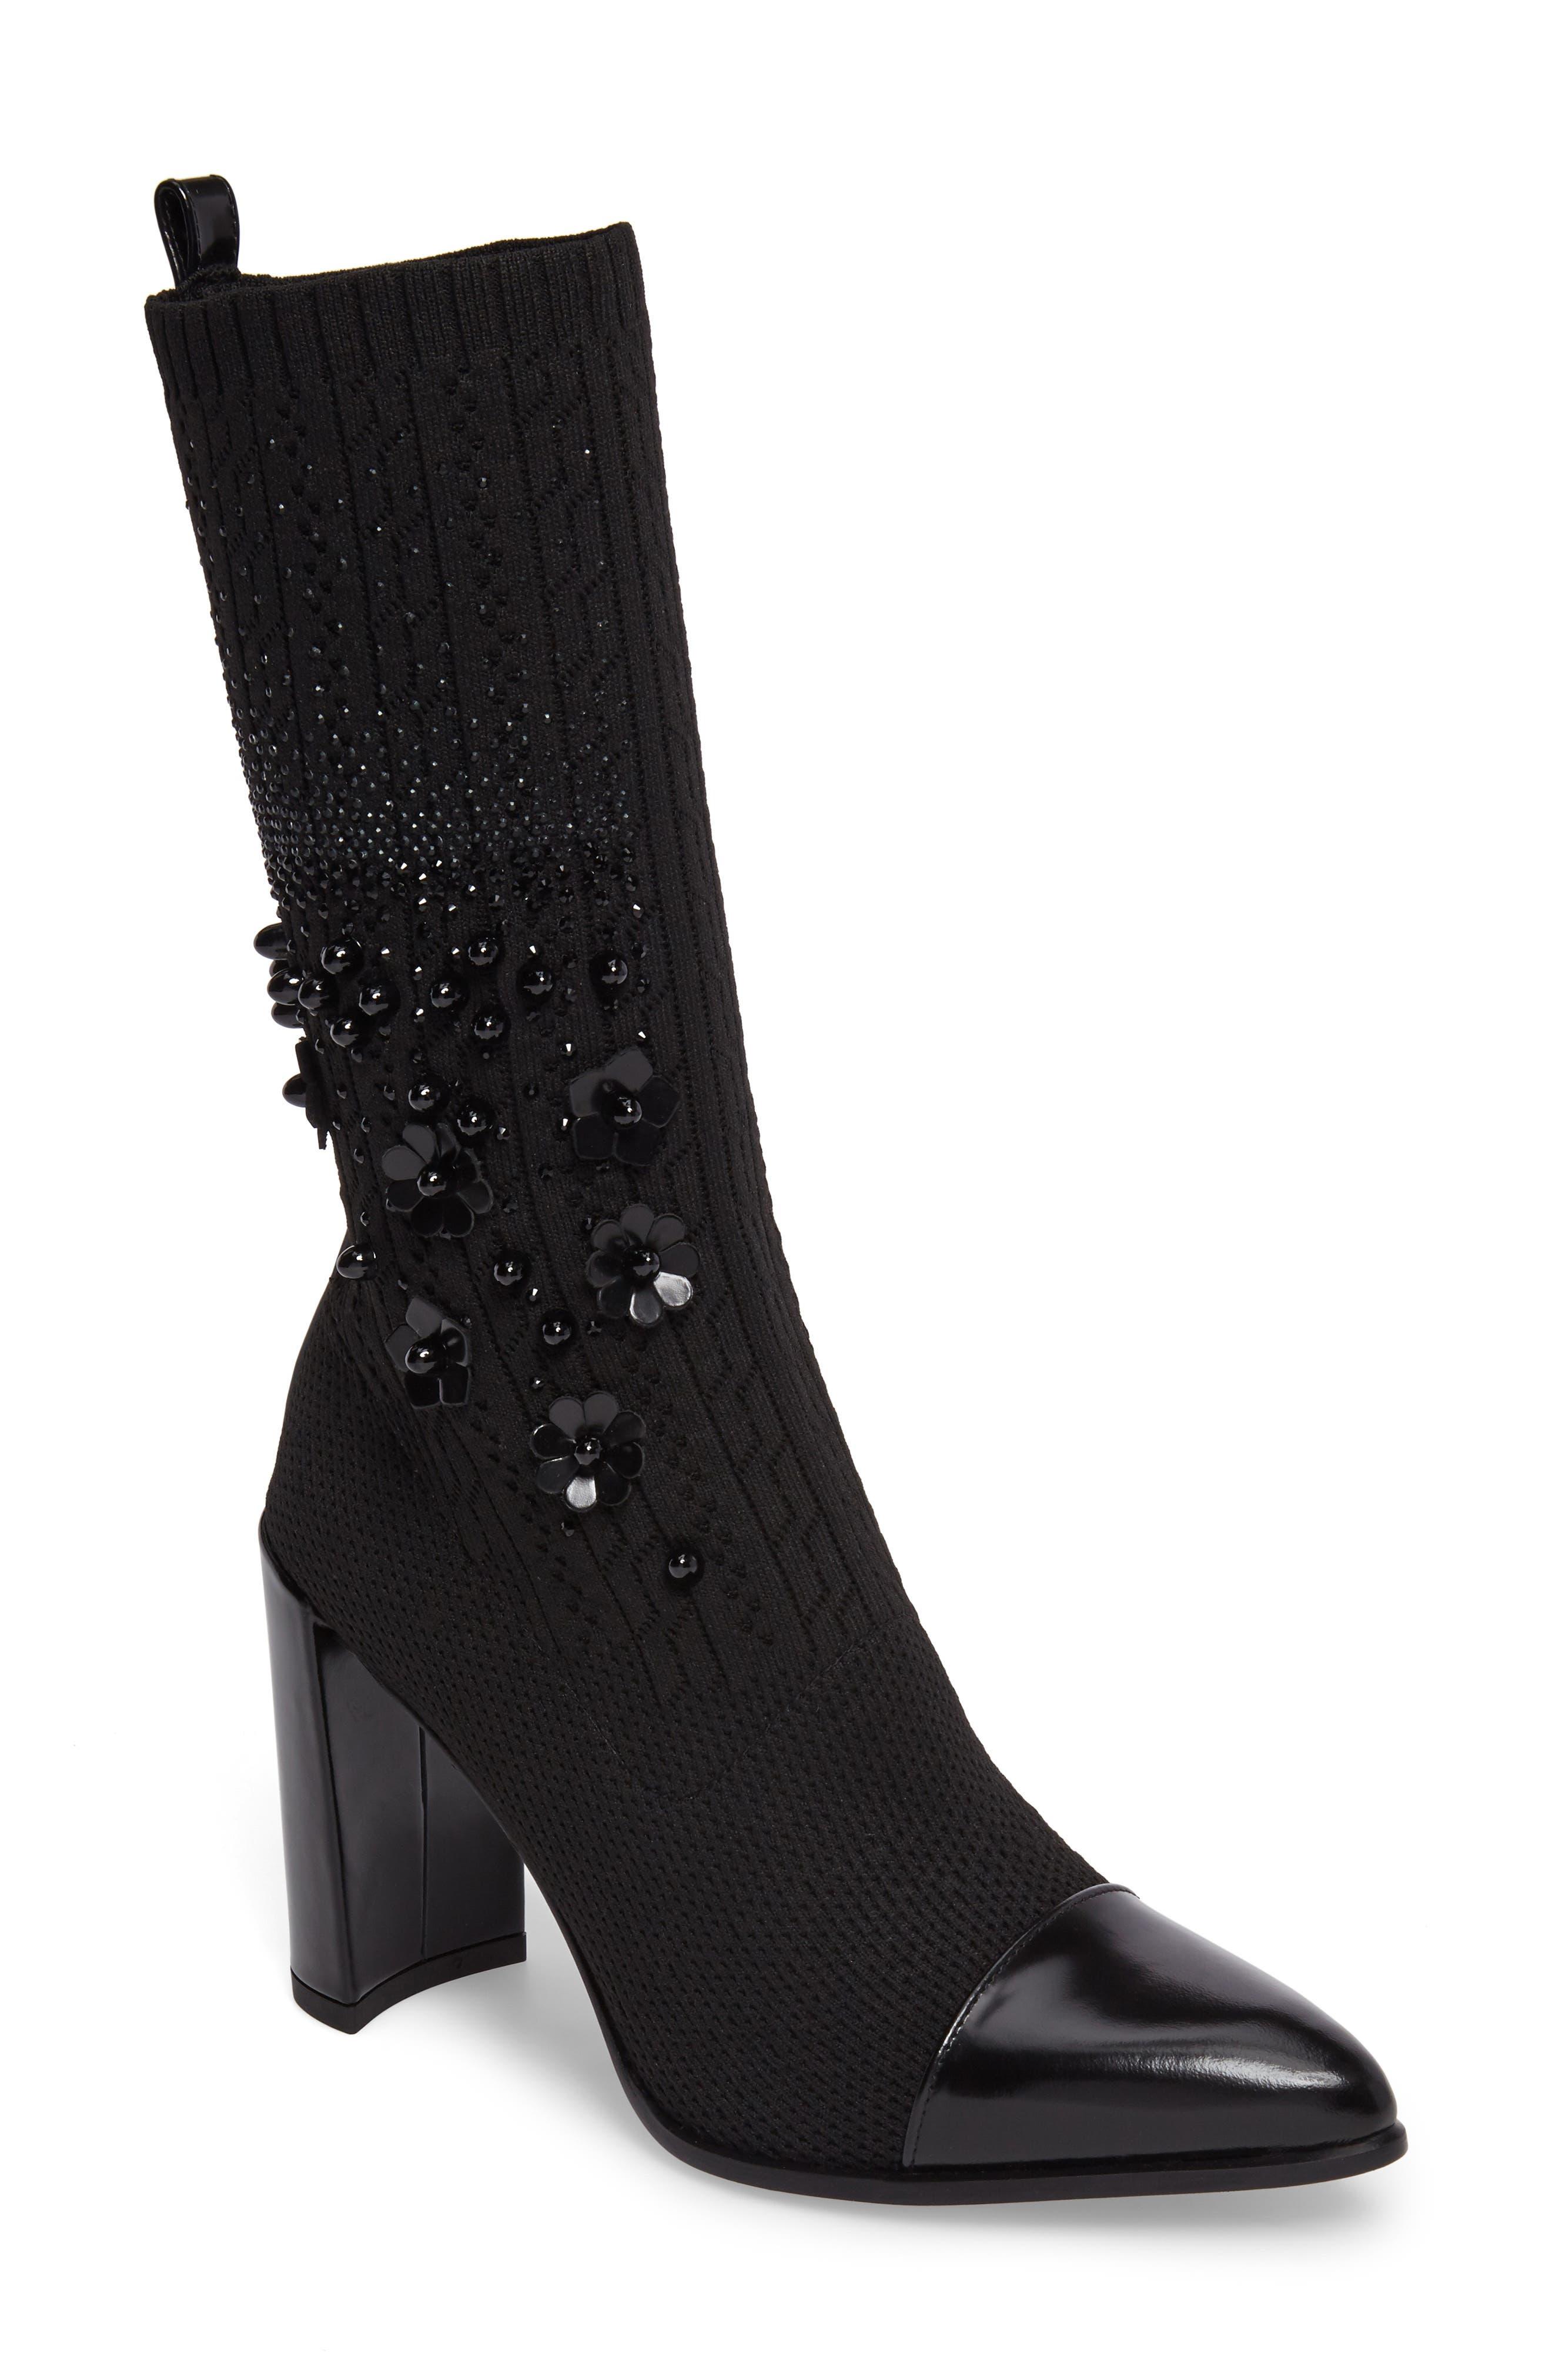 Alternate Image 1 Selected - Stuart Weitzman Sockhop Embellished Boot (Women)